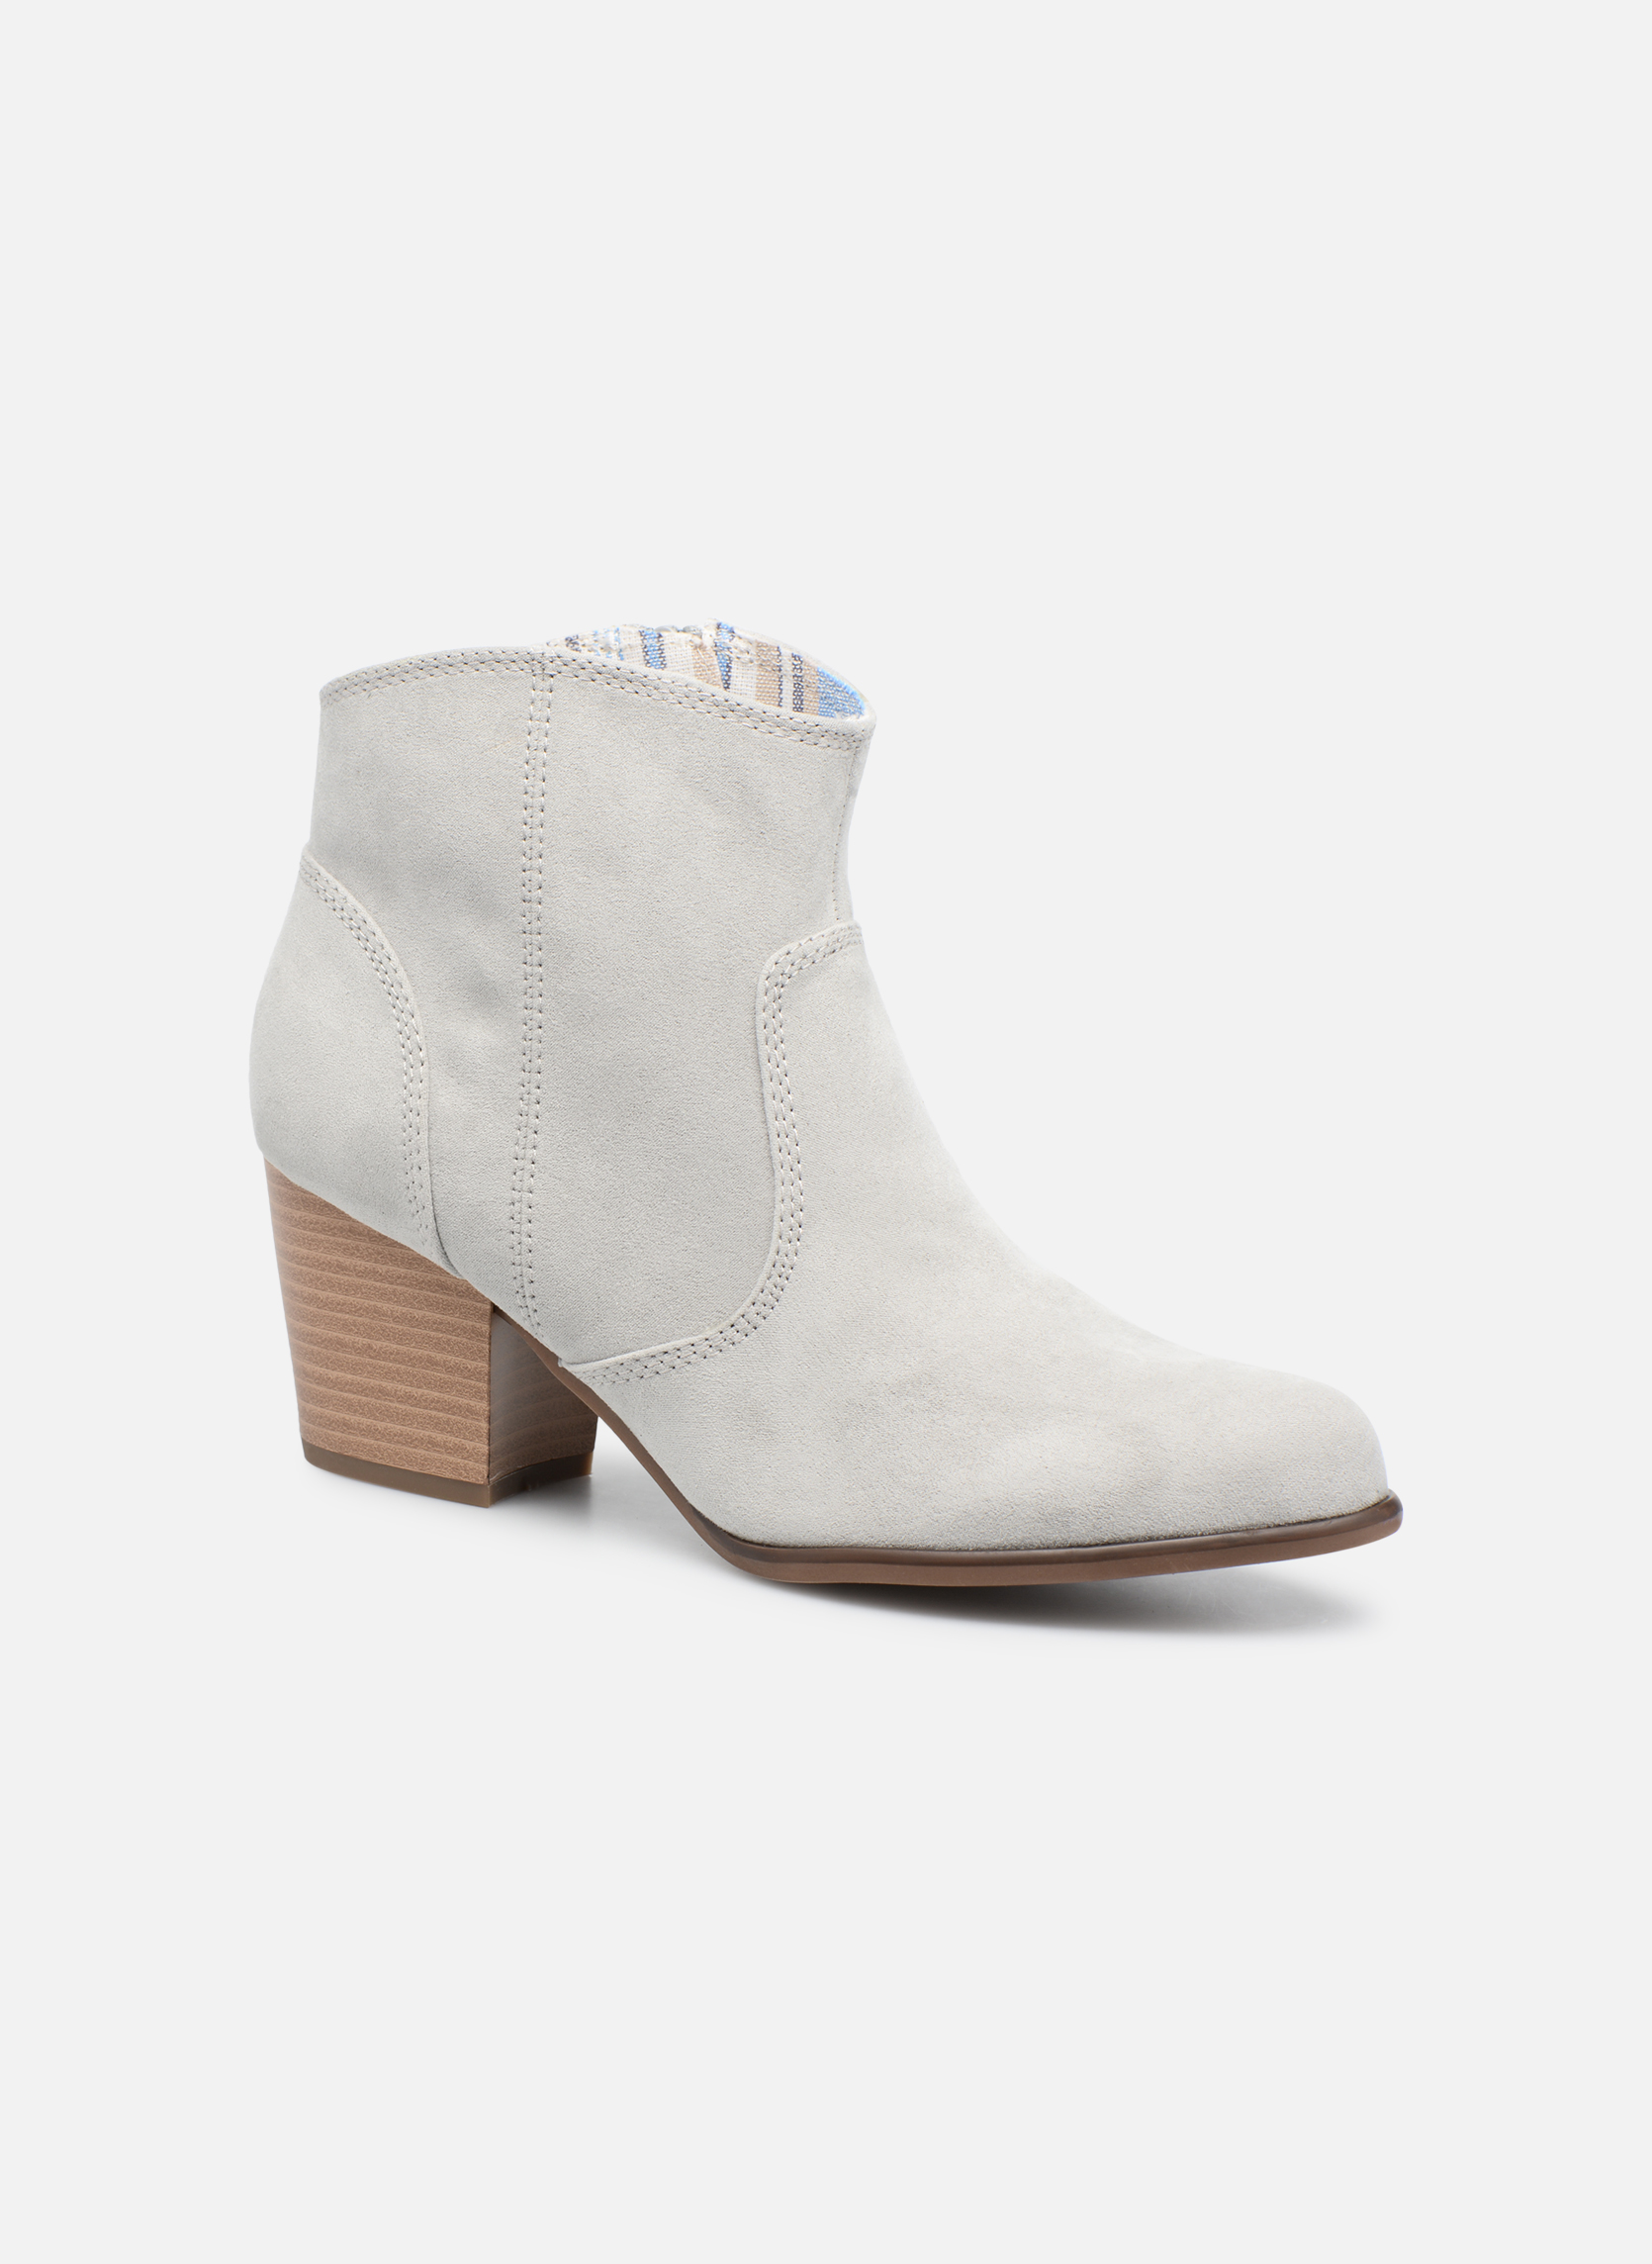 Boots en enkellaarsjes Badda by S.Oliver